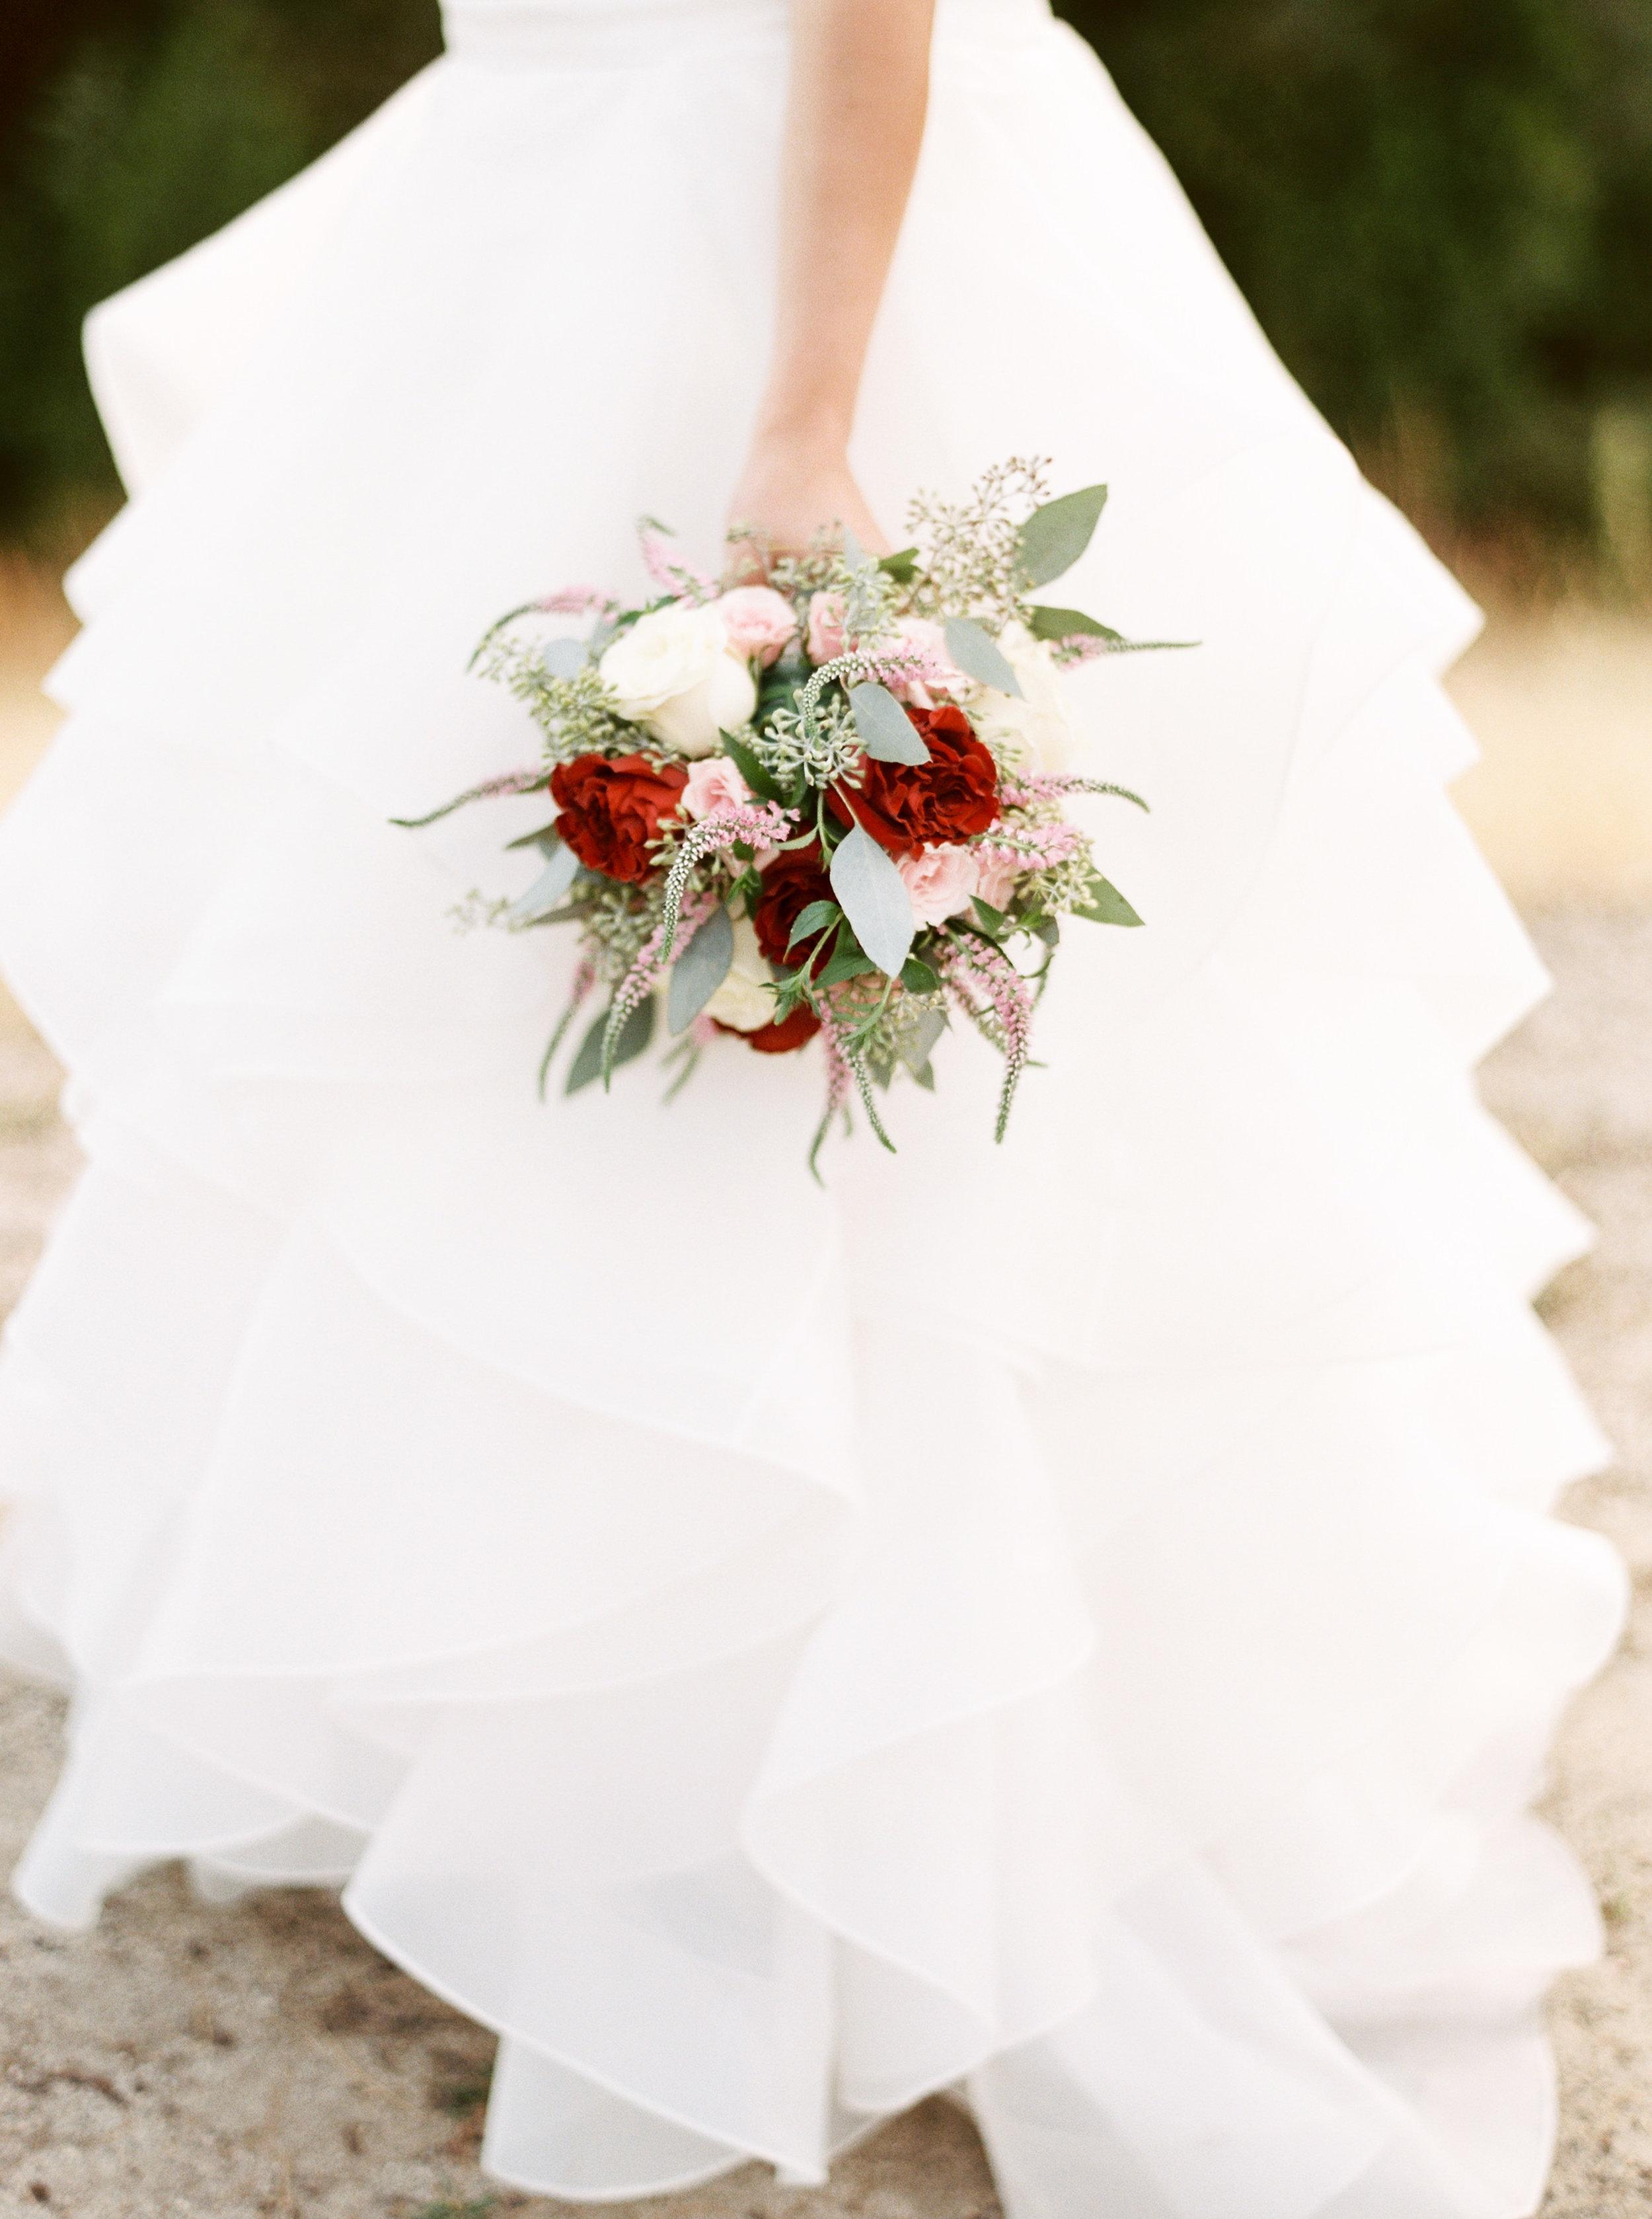 Tenaya-lodge-wedding-at-yosemite-national-park-california-31.jpg